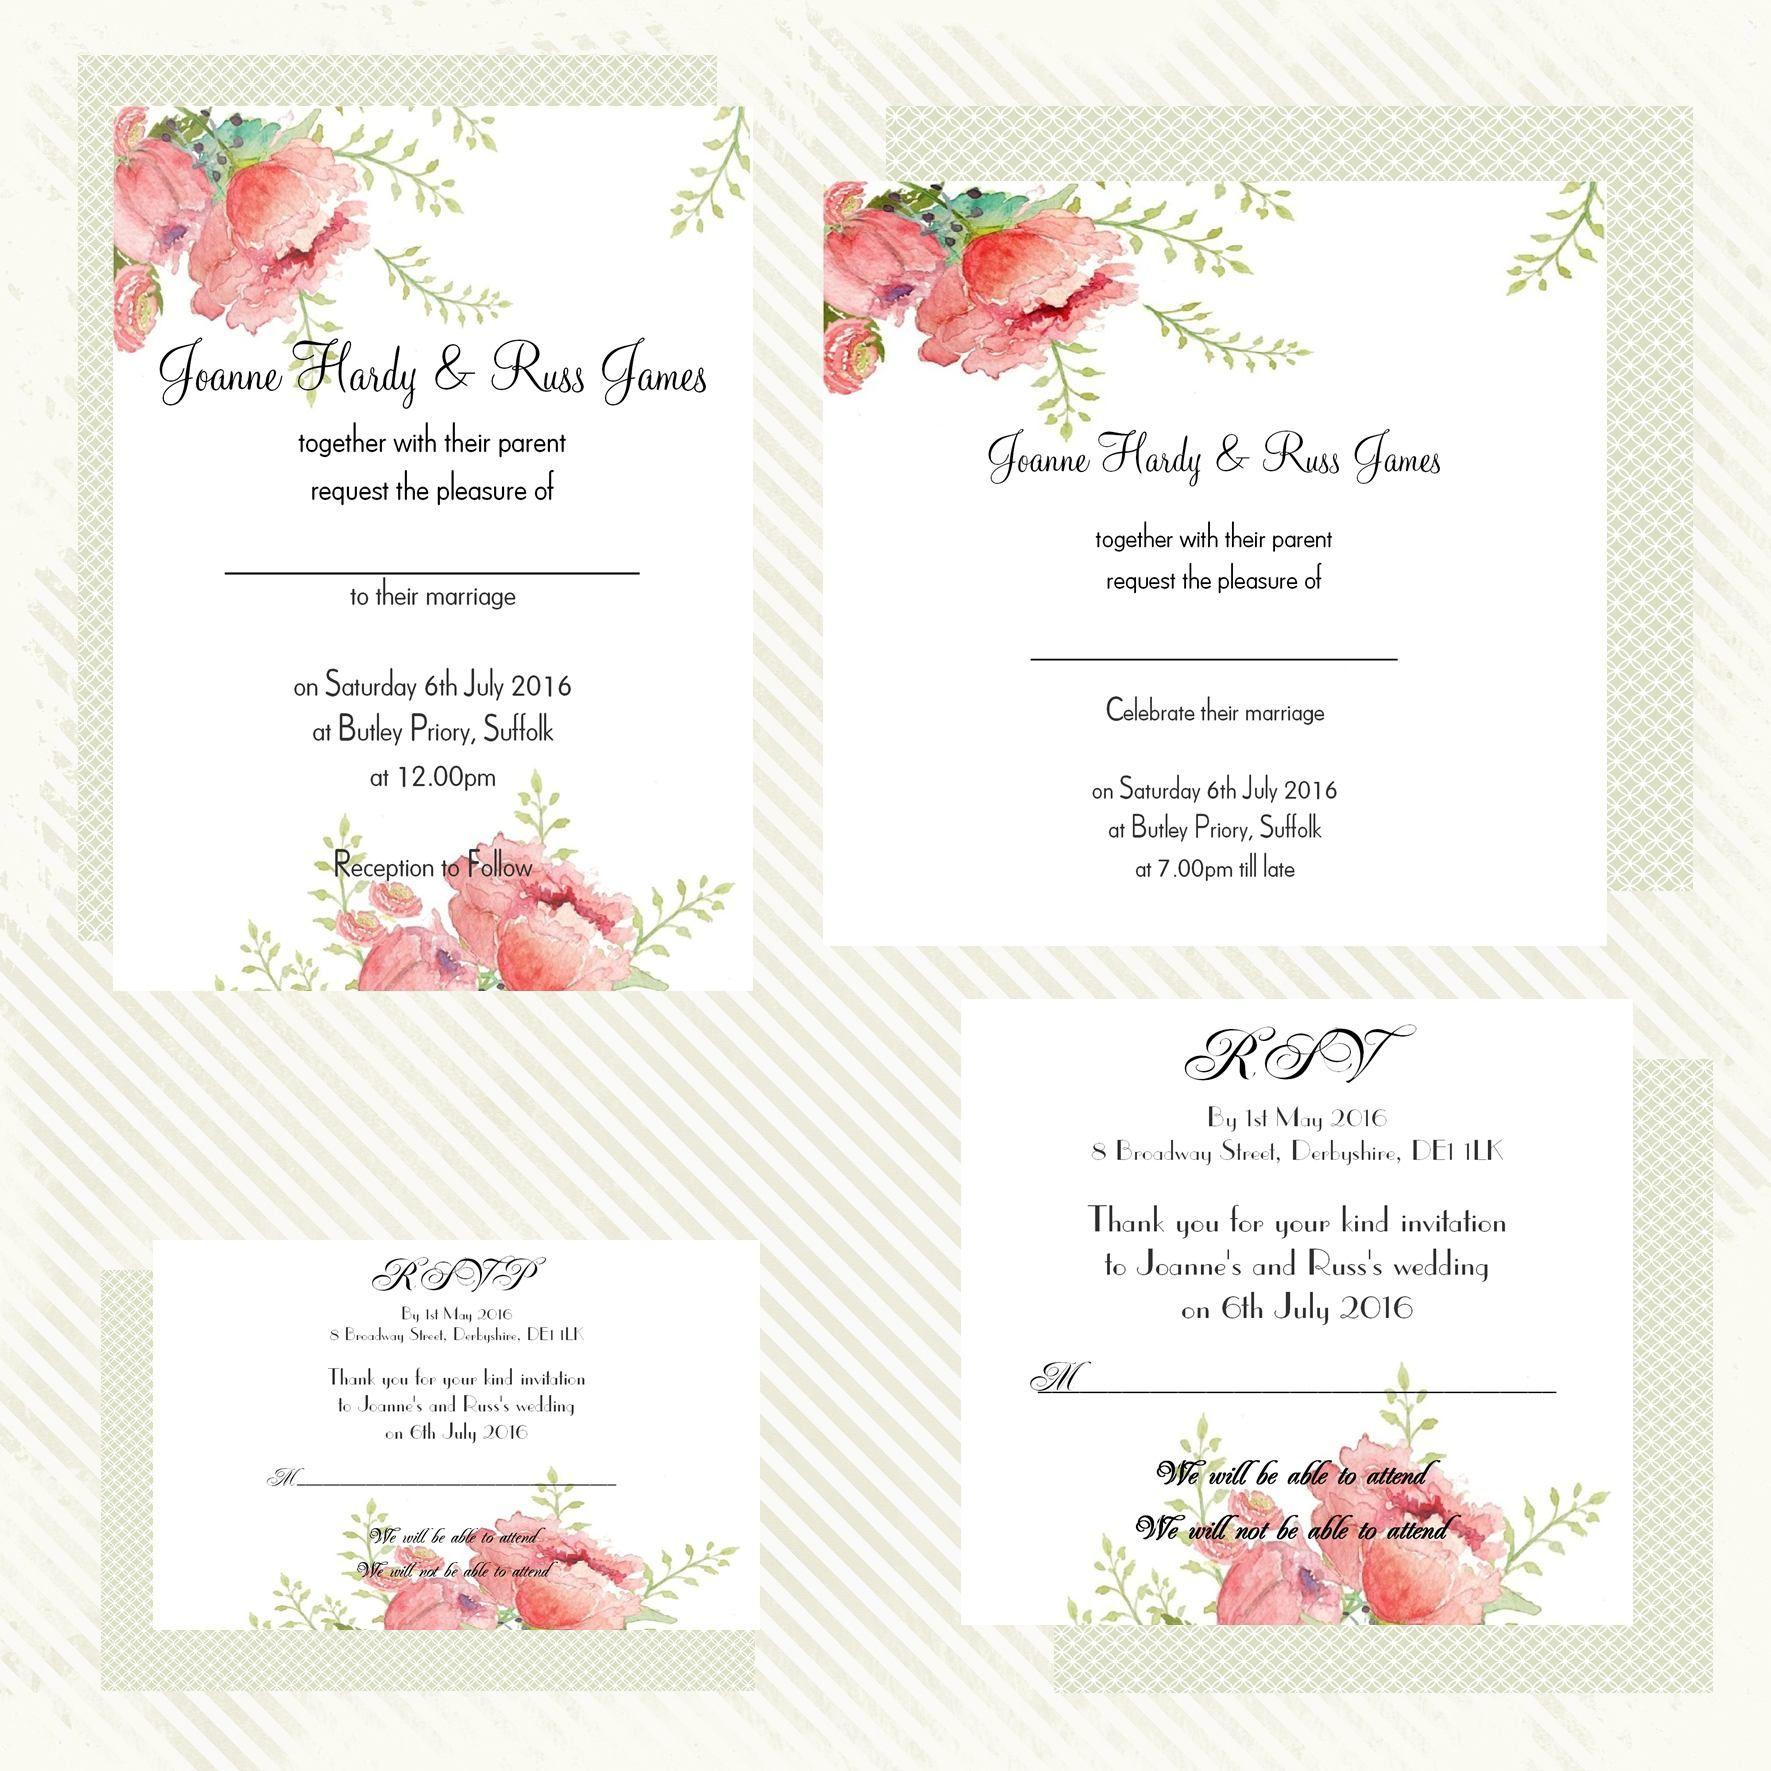 Wedding Invitation Card Stock Blank Wedding Invitation Card Stock Superb Invitation Wedding Invitations Blank Wedding Invitations Wedding Invitation Cards